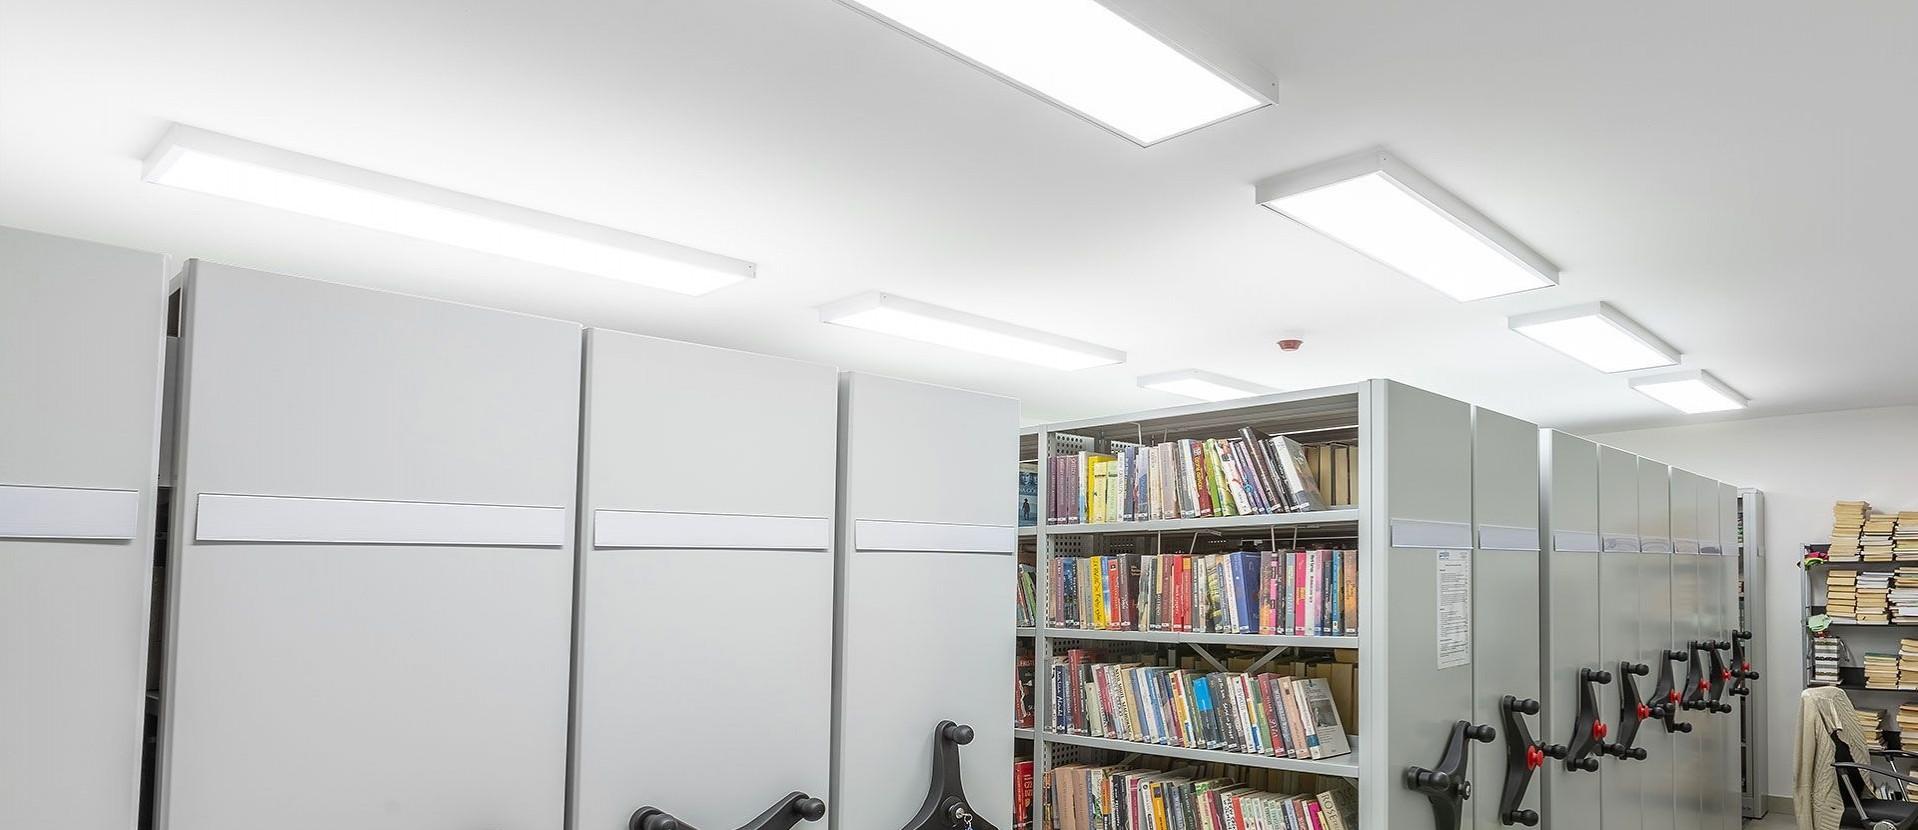 Biblioteka Racibórz #5